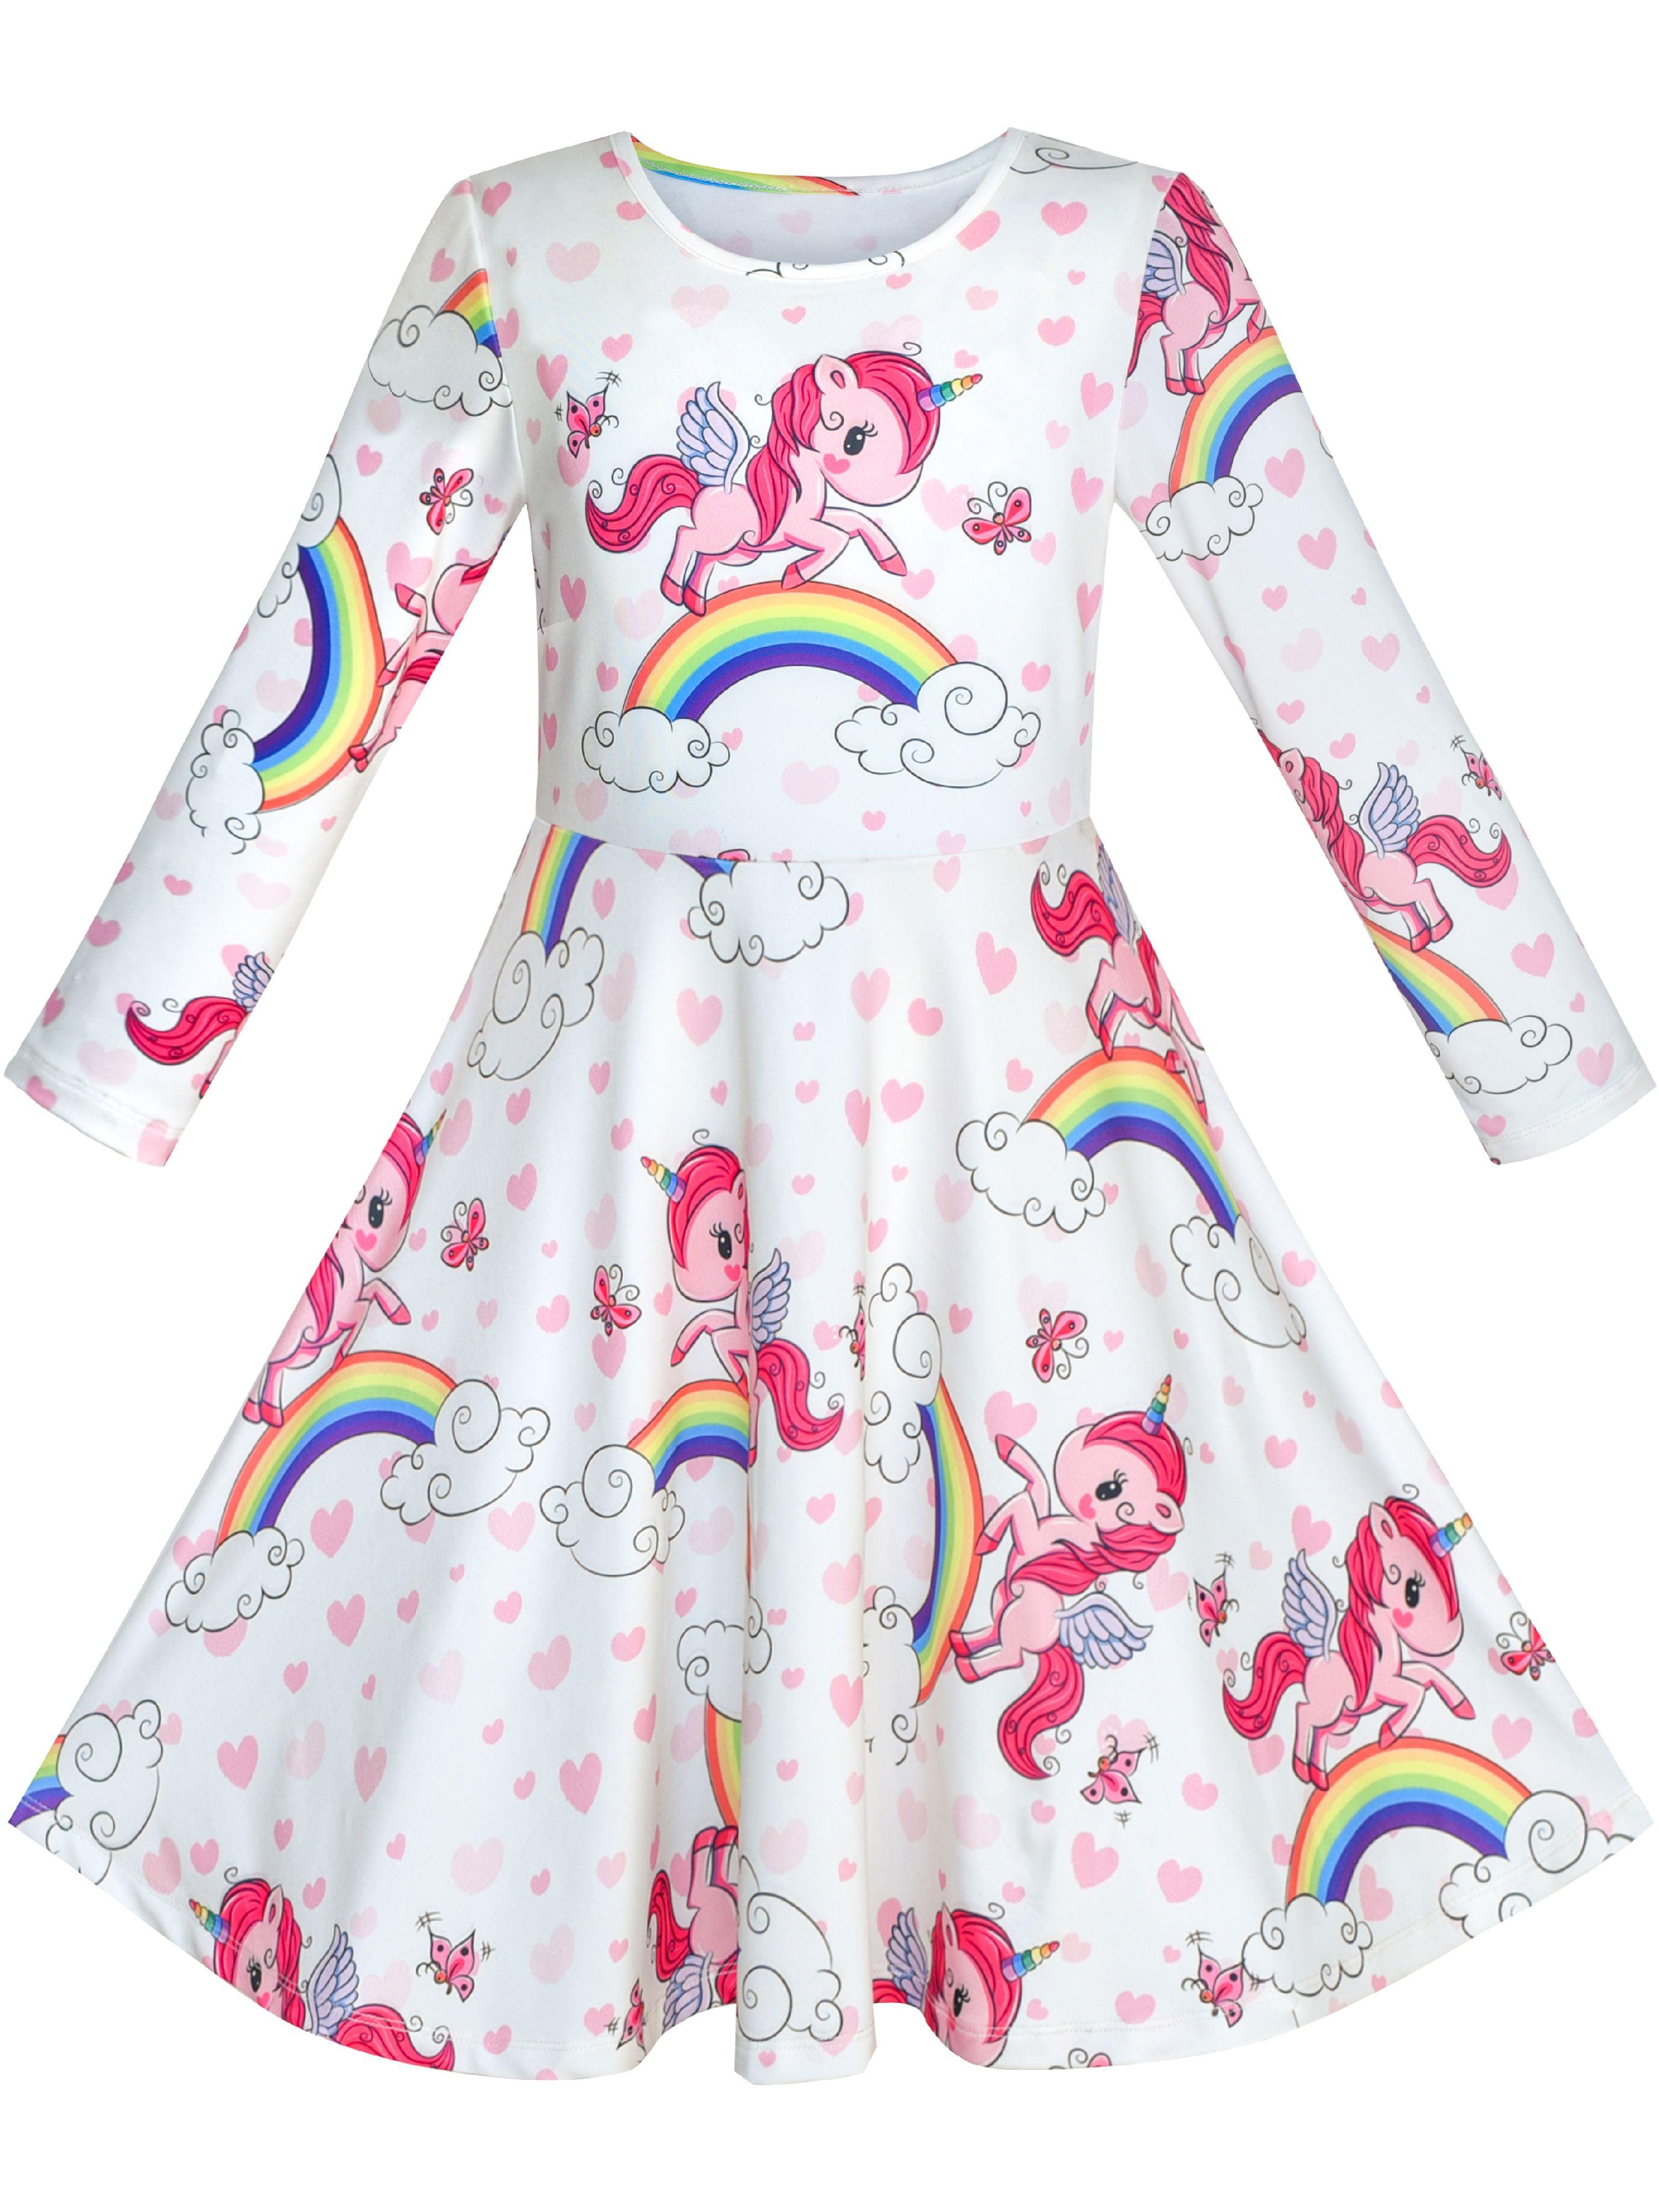 Girls Unicorn Rainbow Dress Children Summer Casual Clothes